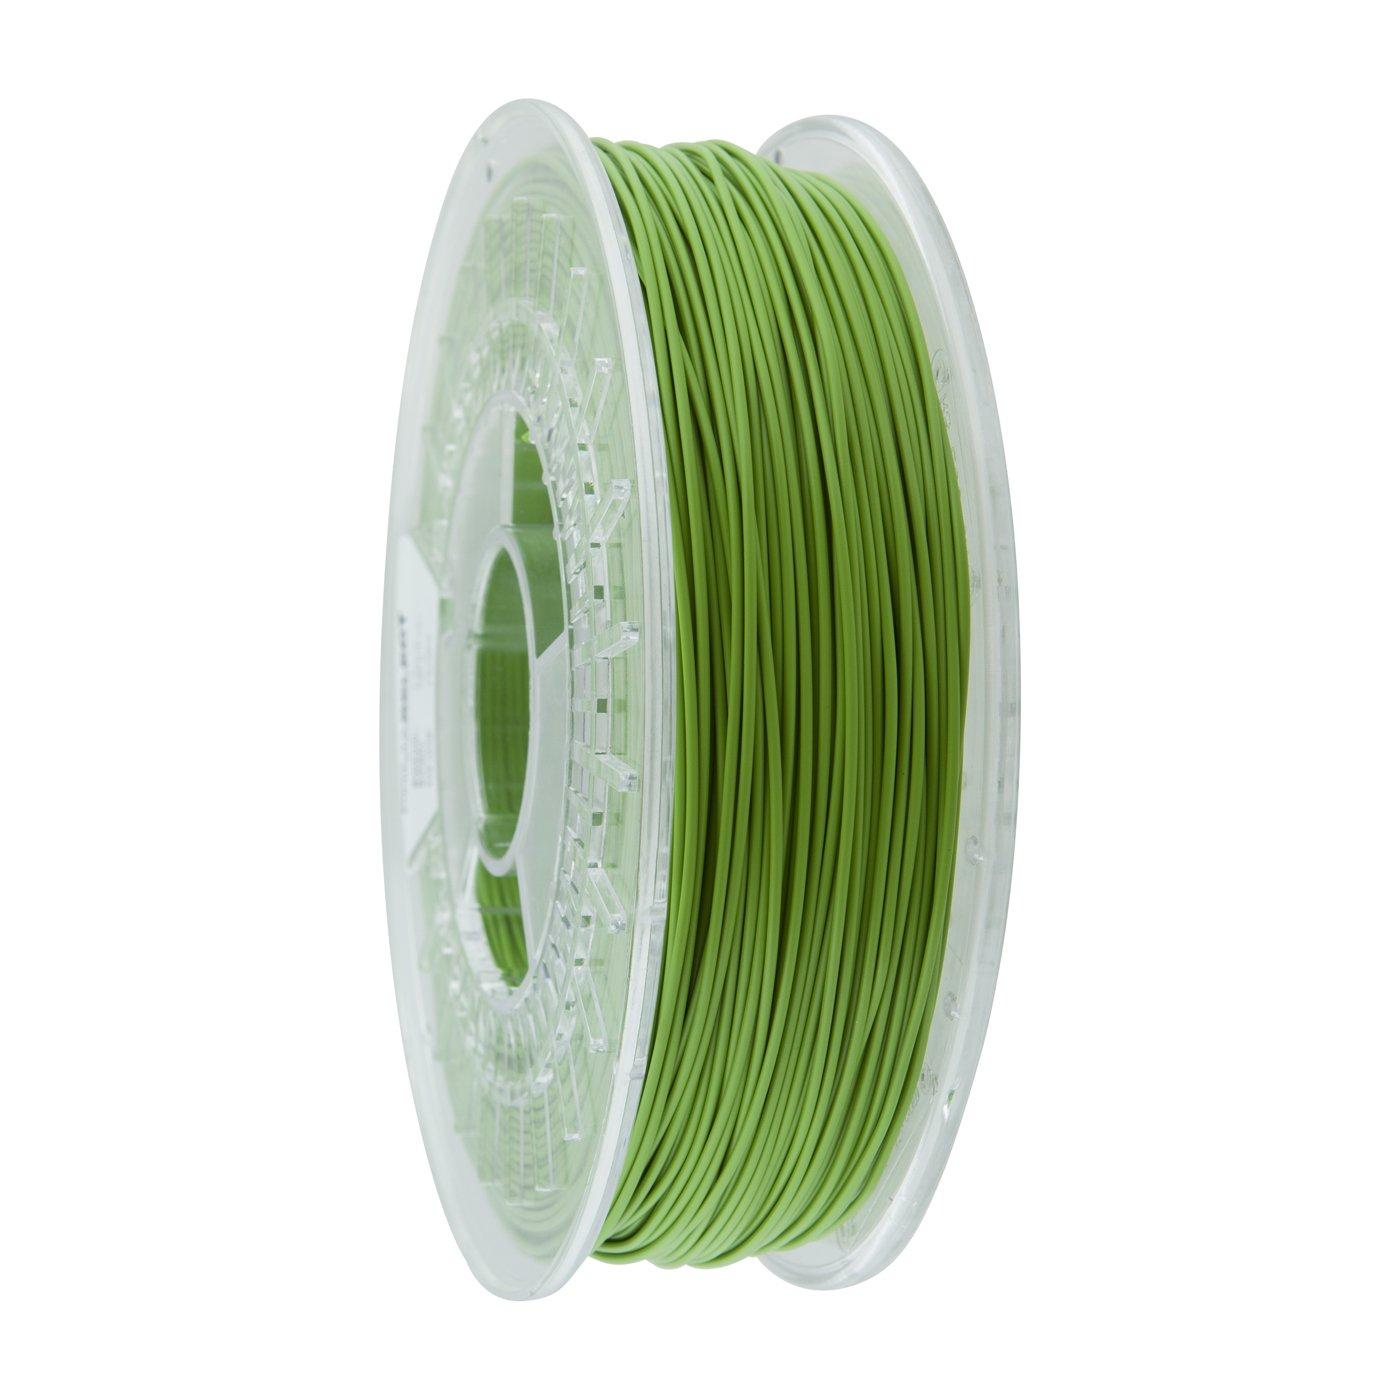 PrimaCreator PrimaSelect 3D Drucker Filament - ABS - 1,75 1,75 1,75 mm - 750 g - Rot B01KRPKT26 Filament-3D-Druckmaterialien f2d6d0